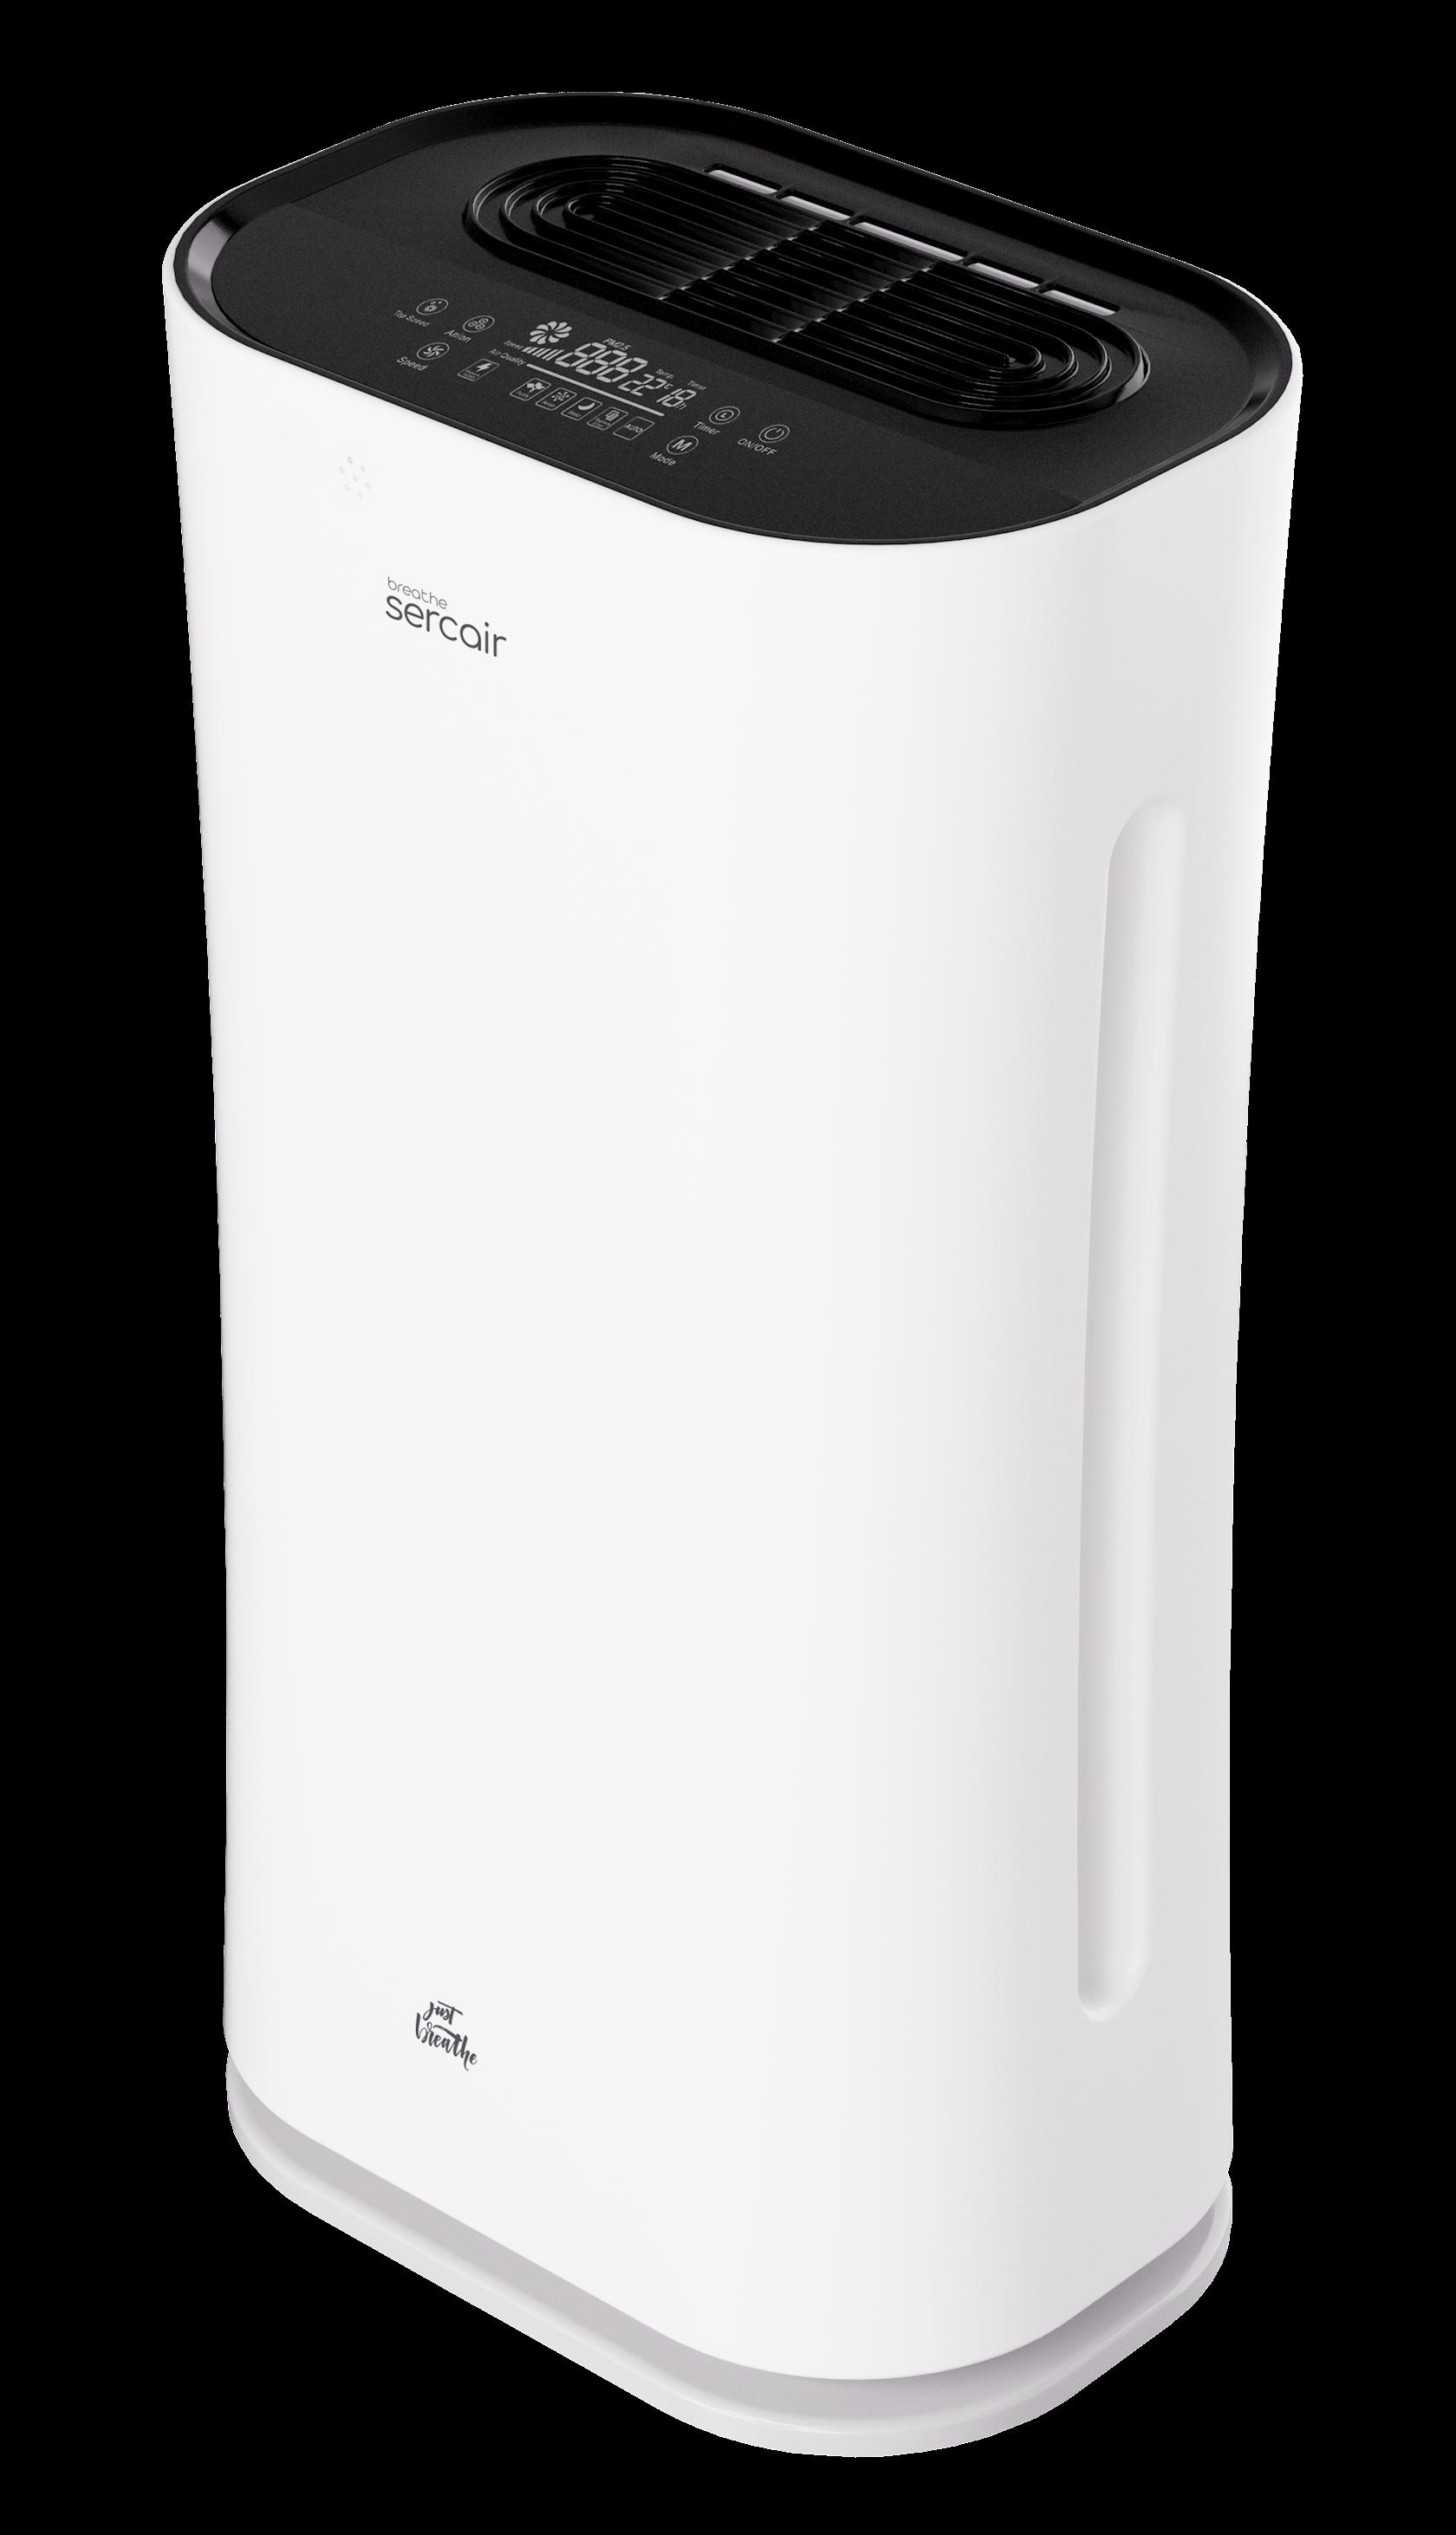 Hava təmizləyici Sercair Breathe Air Purifier HEPA filter, UV sistemli